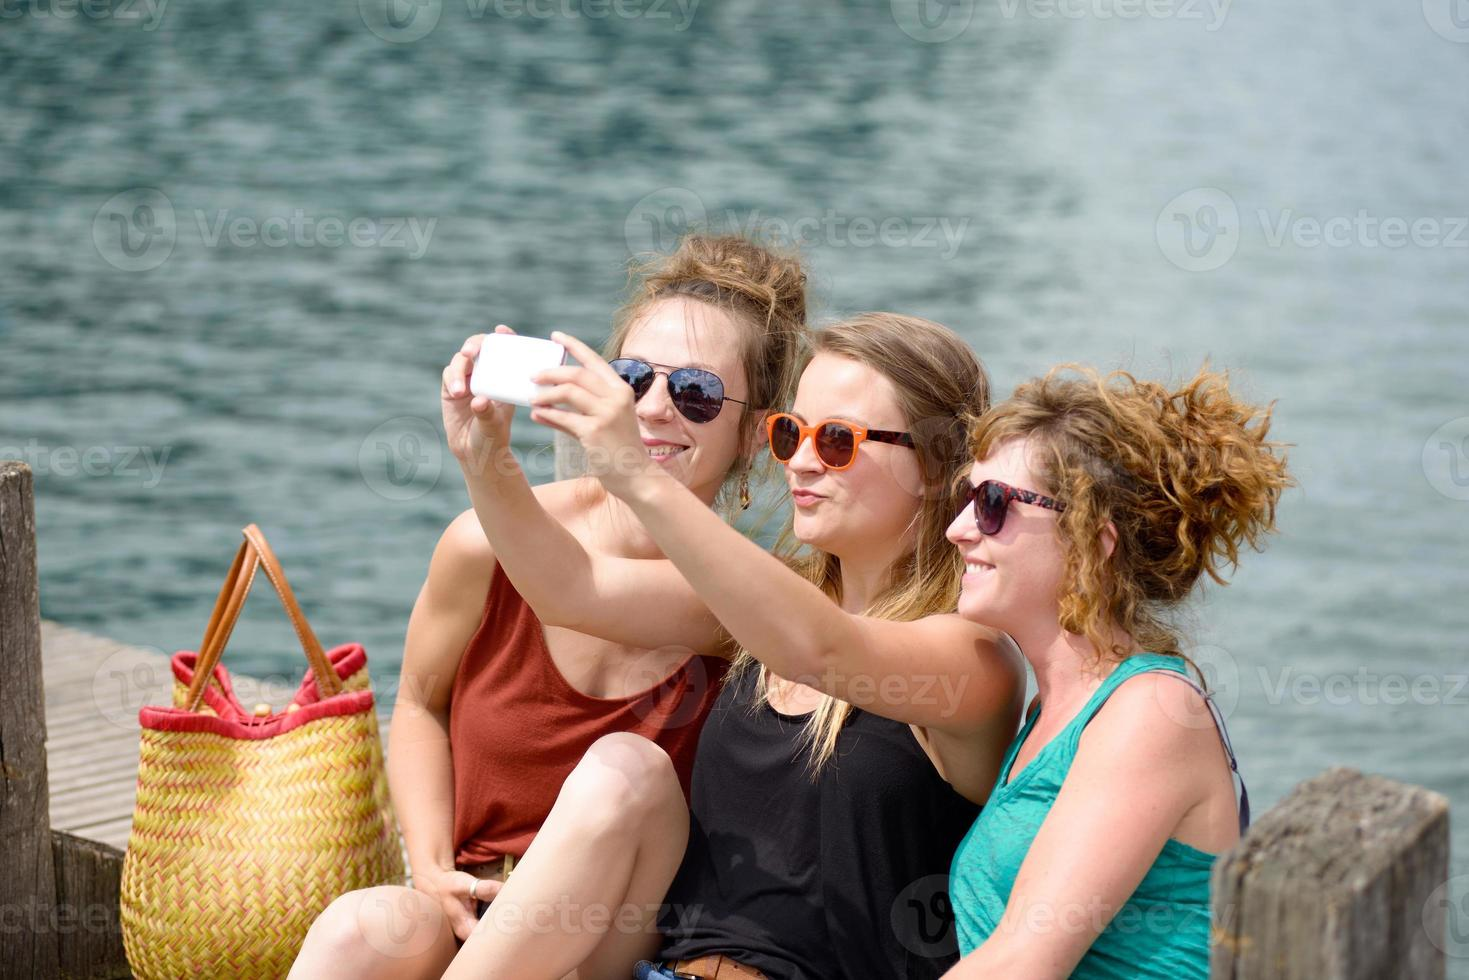 drei junge Frau am Strand mit ihrem Telefon foto